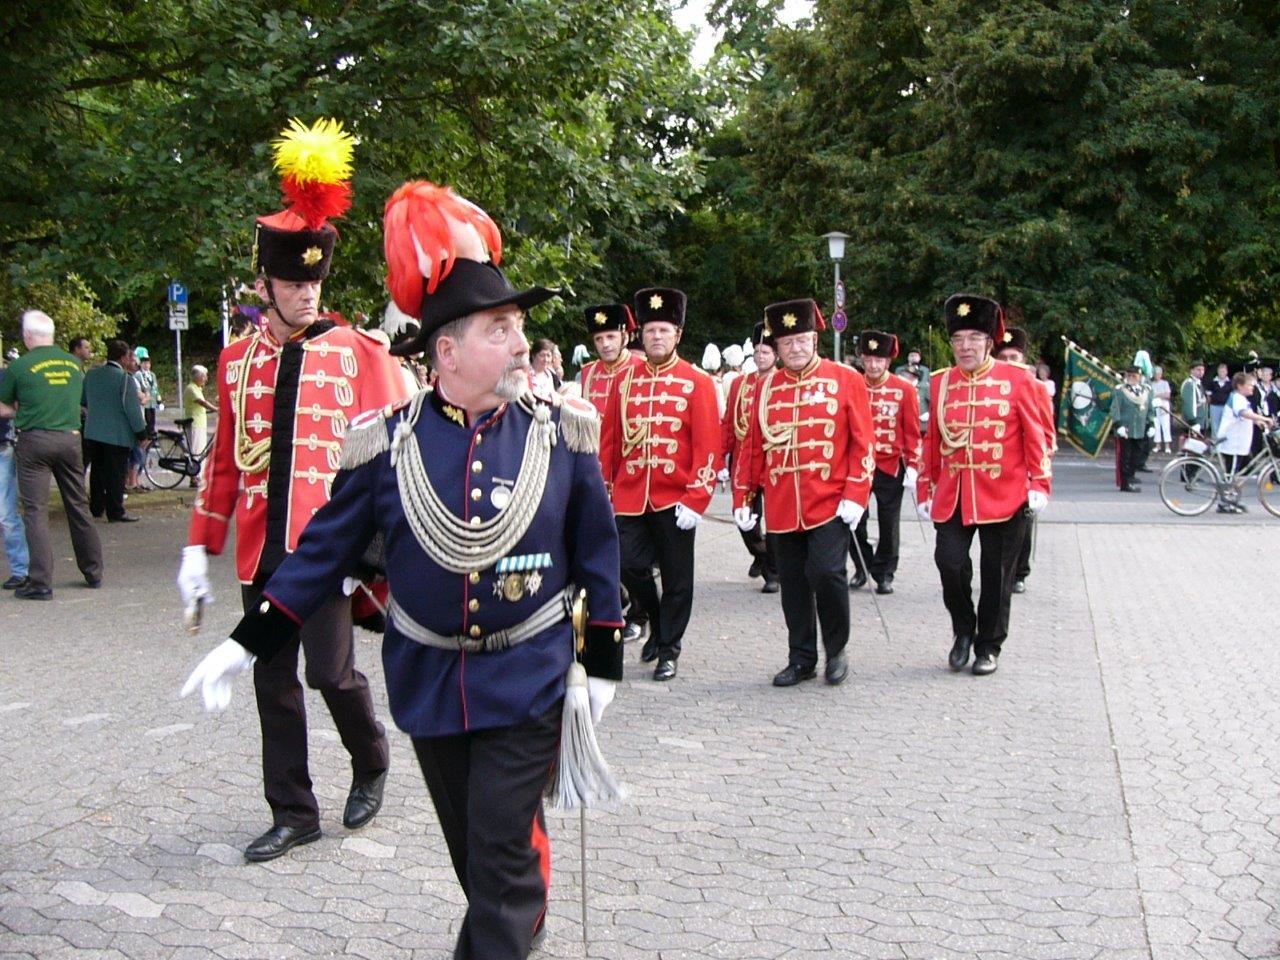 2009 Schützenfest Tiefers 034